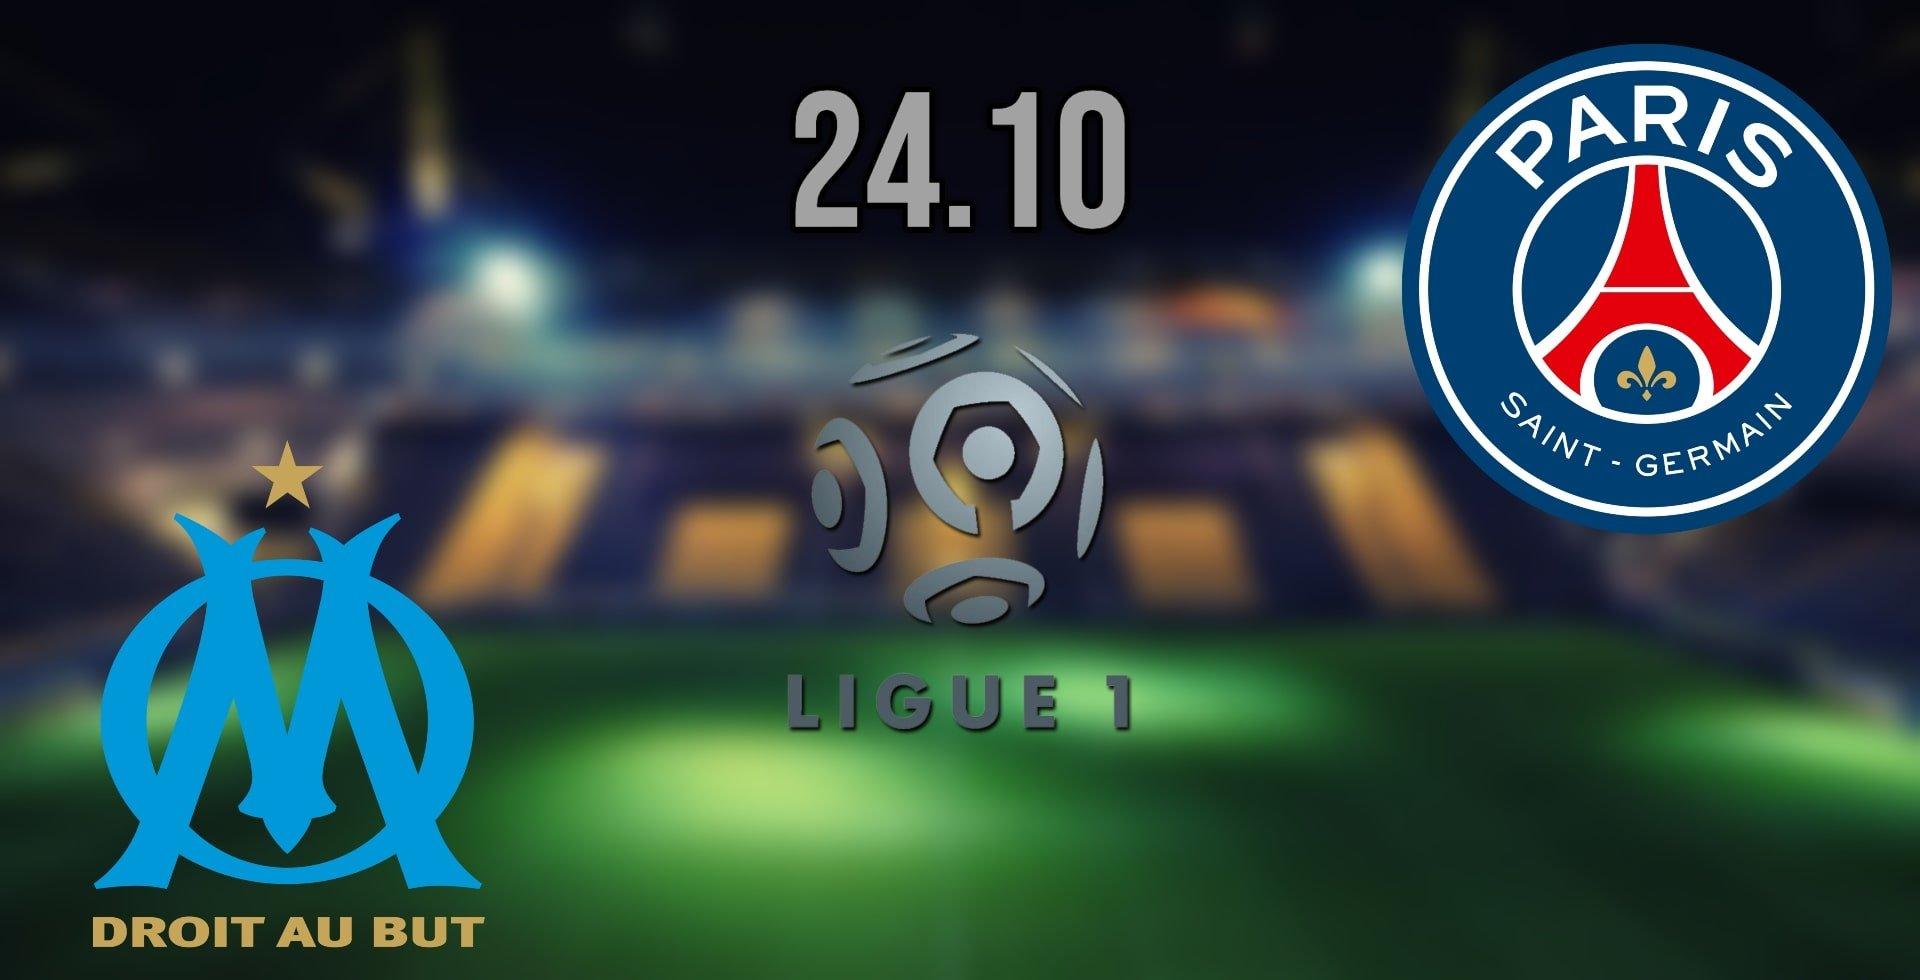 Marseille vs PSG Prediction: Ligue 1 Match on 24.10.2021